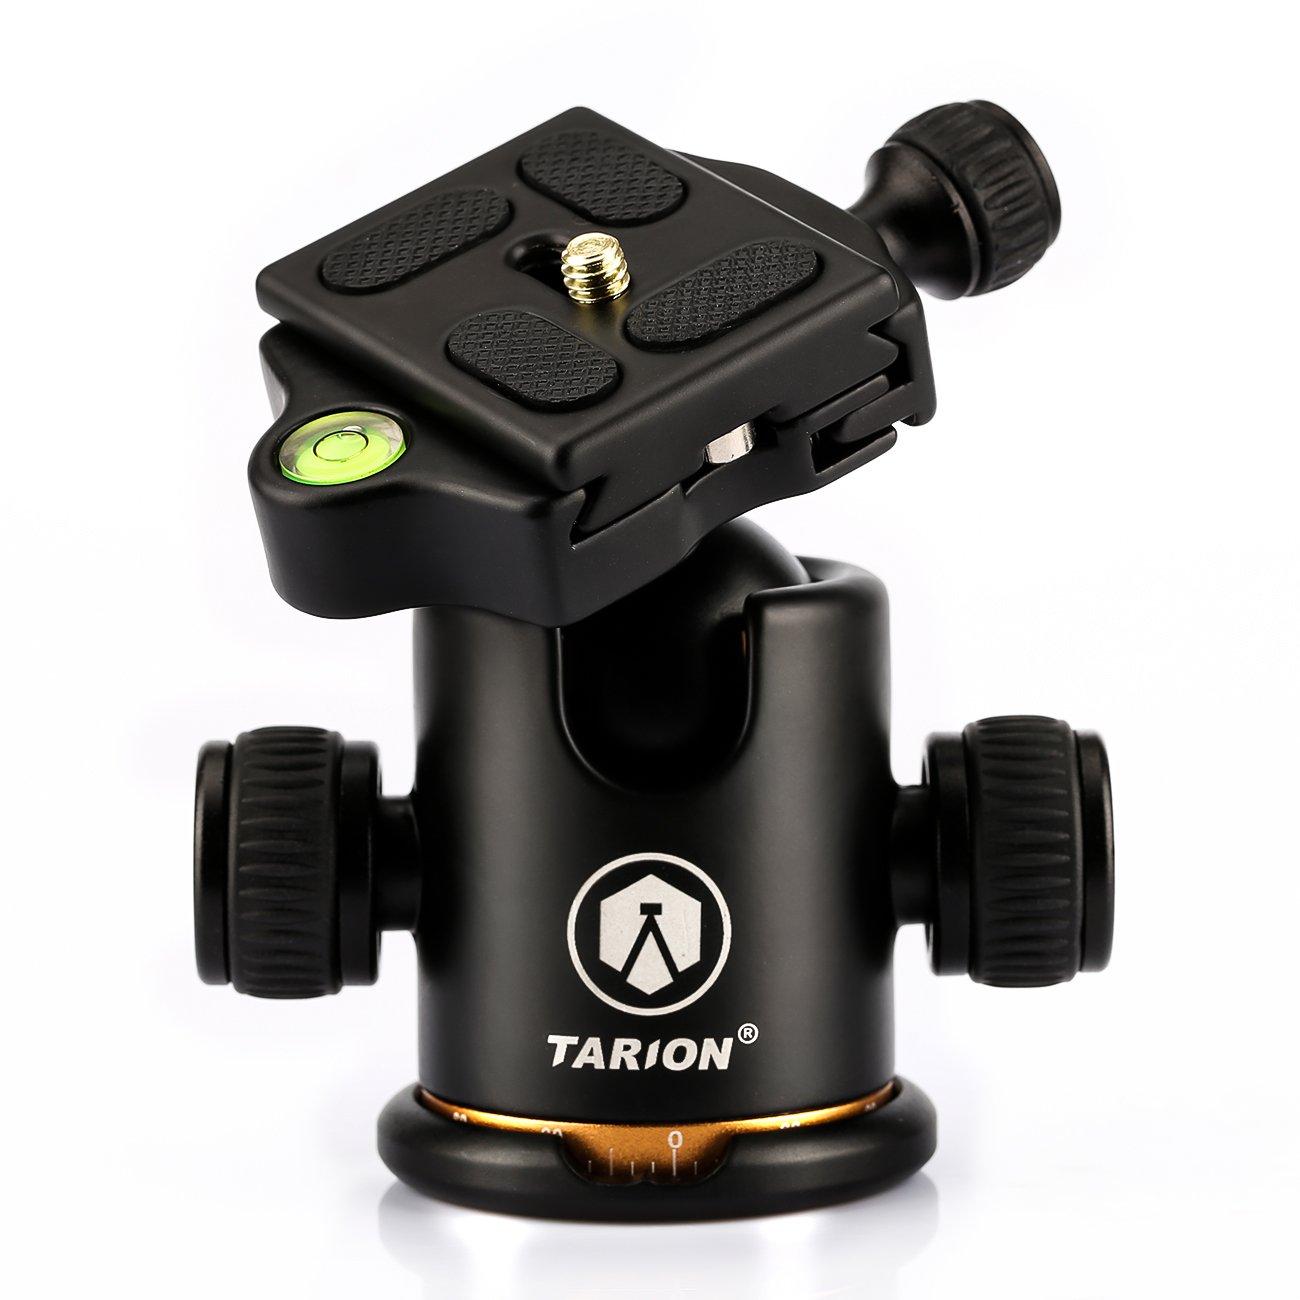 TARION Q03 Professional DSLR 360 Degree Tripod Ball Head Ballhead with Quick Release Three Control Knobs for Canon Nikon Sony Pentax Cameras or Mirrorless